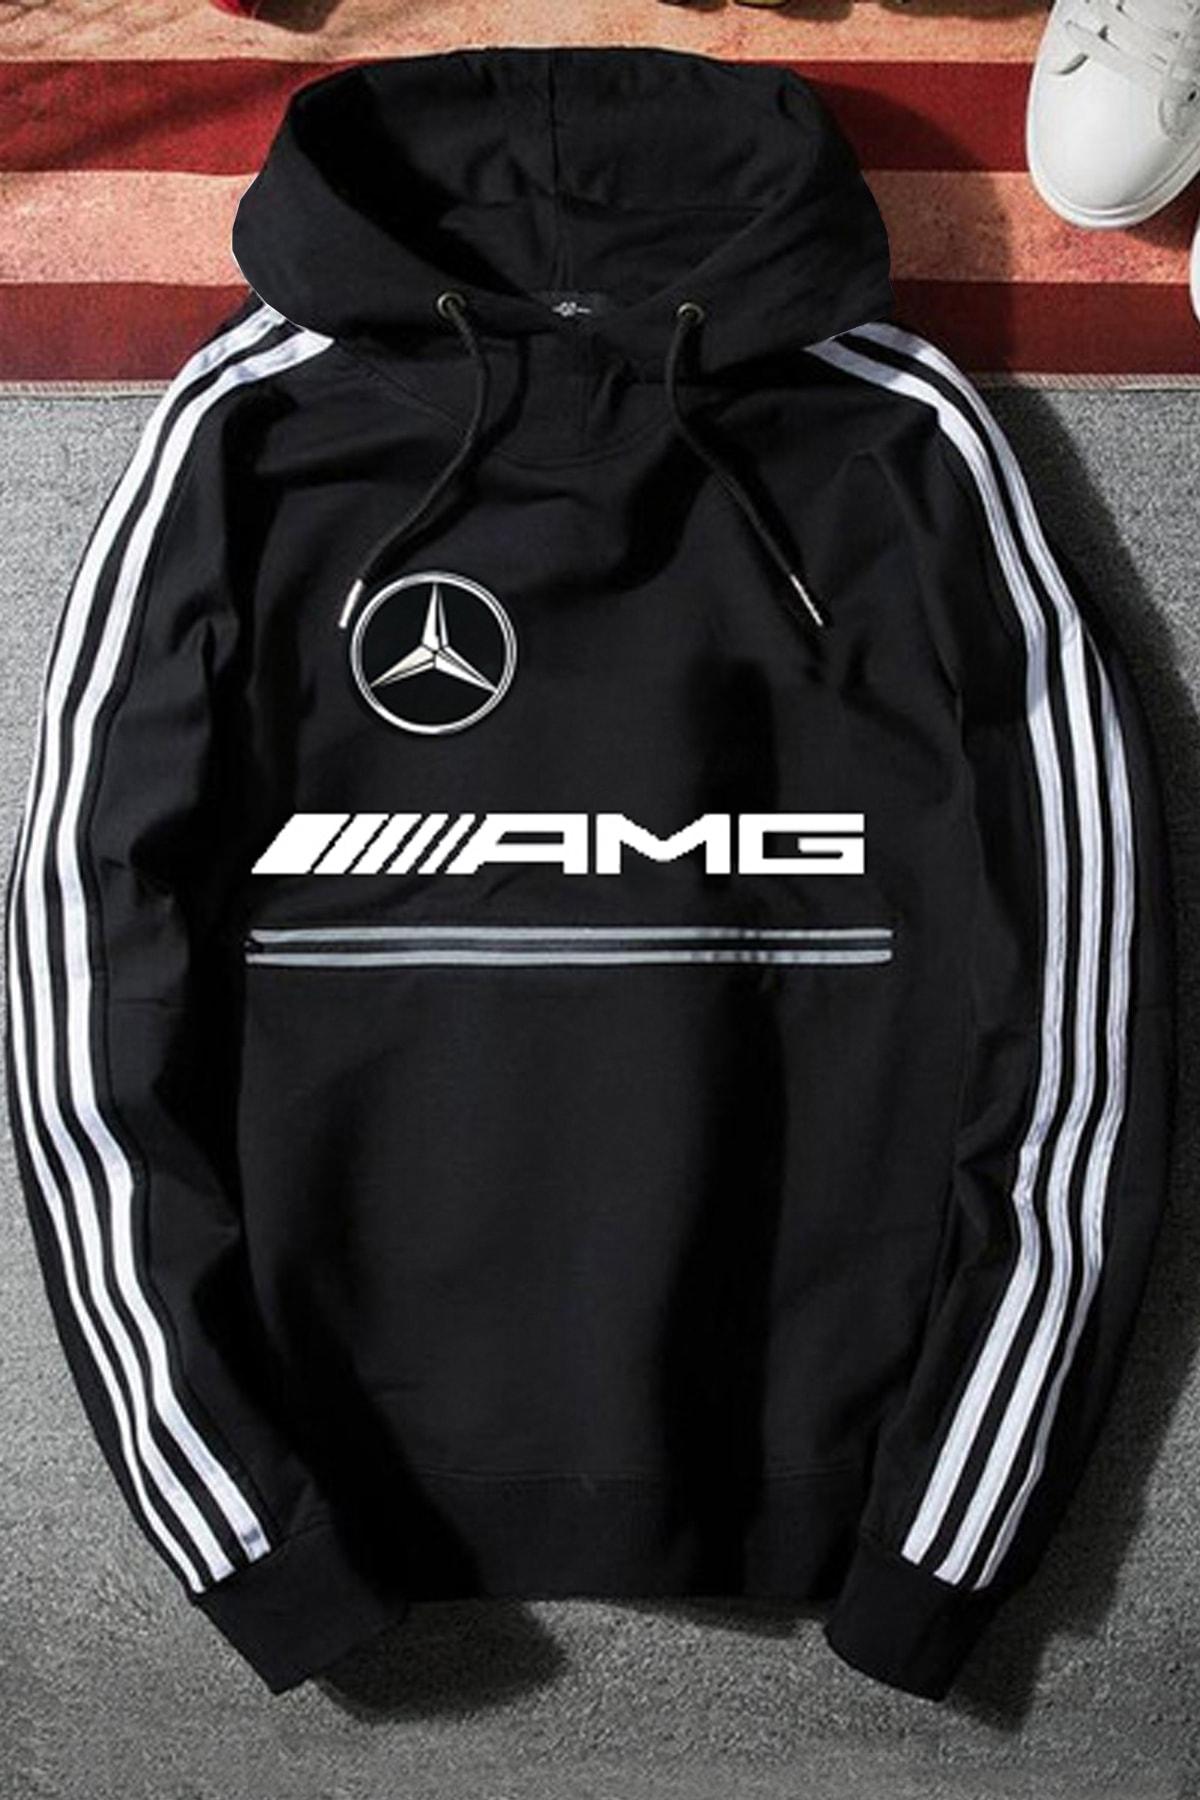 WEST BULLS Unisex Siyah Mercedes Amg Kapüşonlu Baskılı Oversize Sweatshirt 1